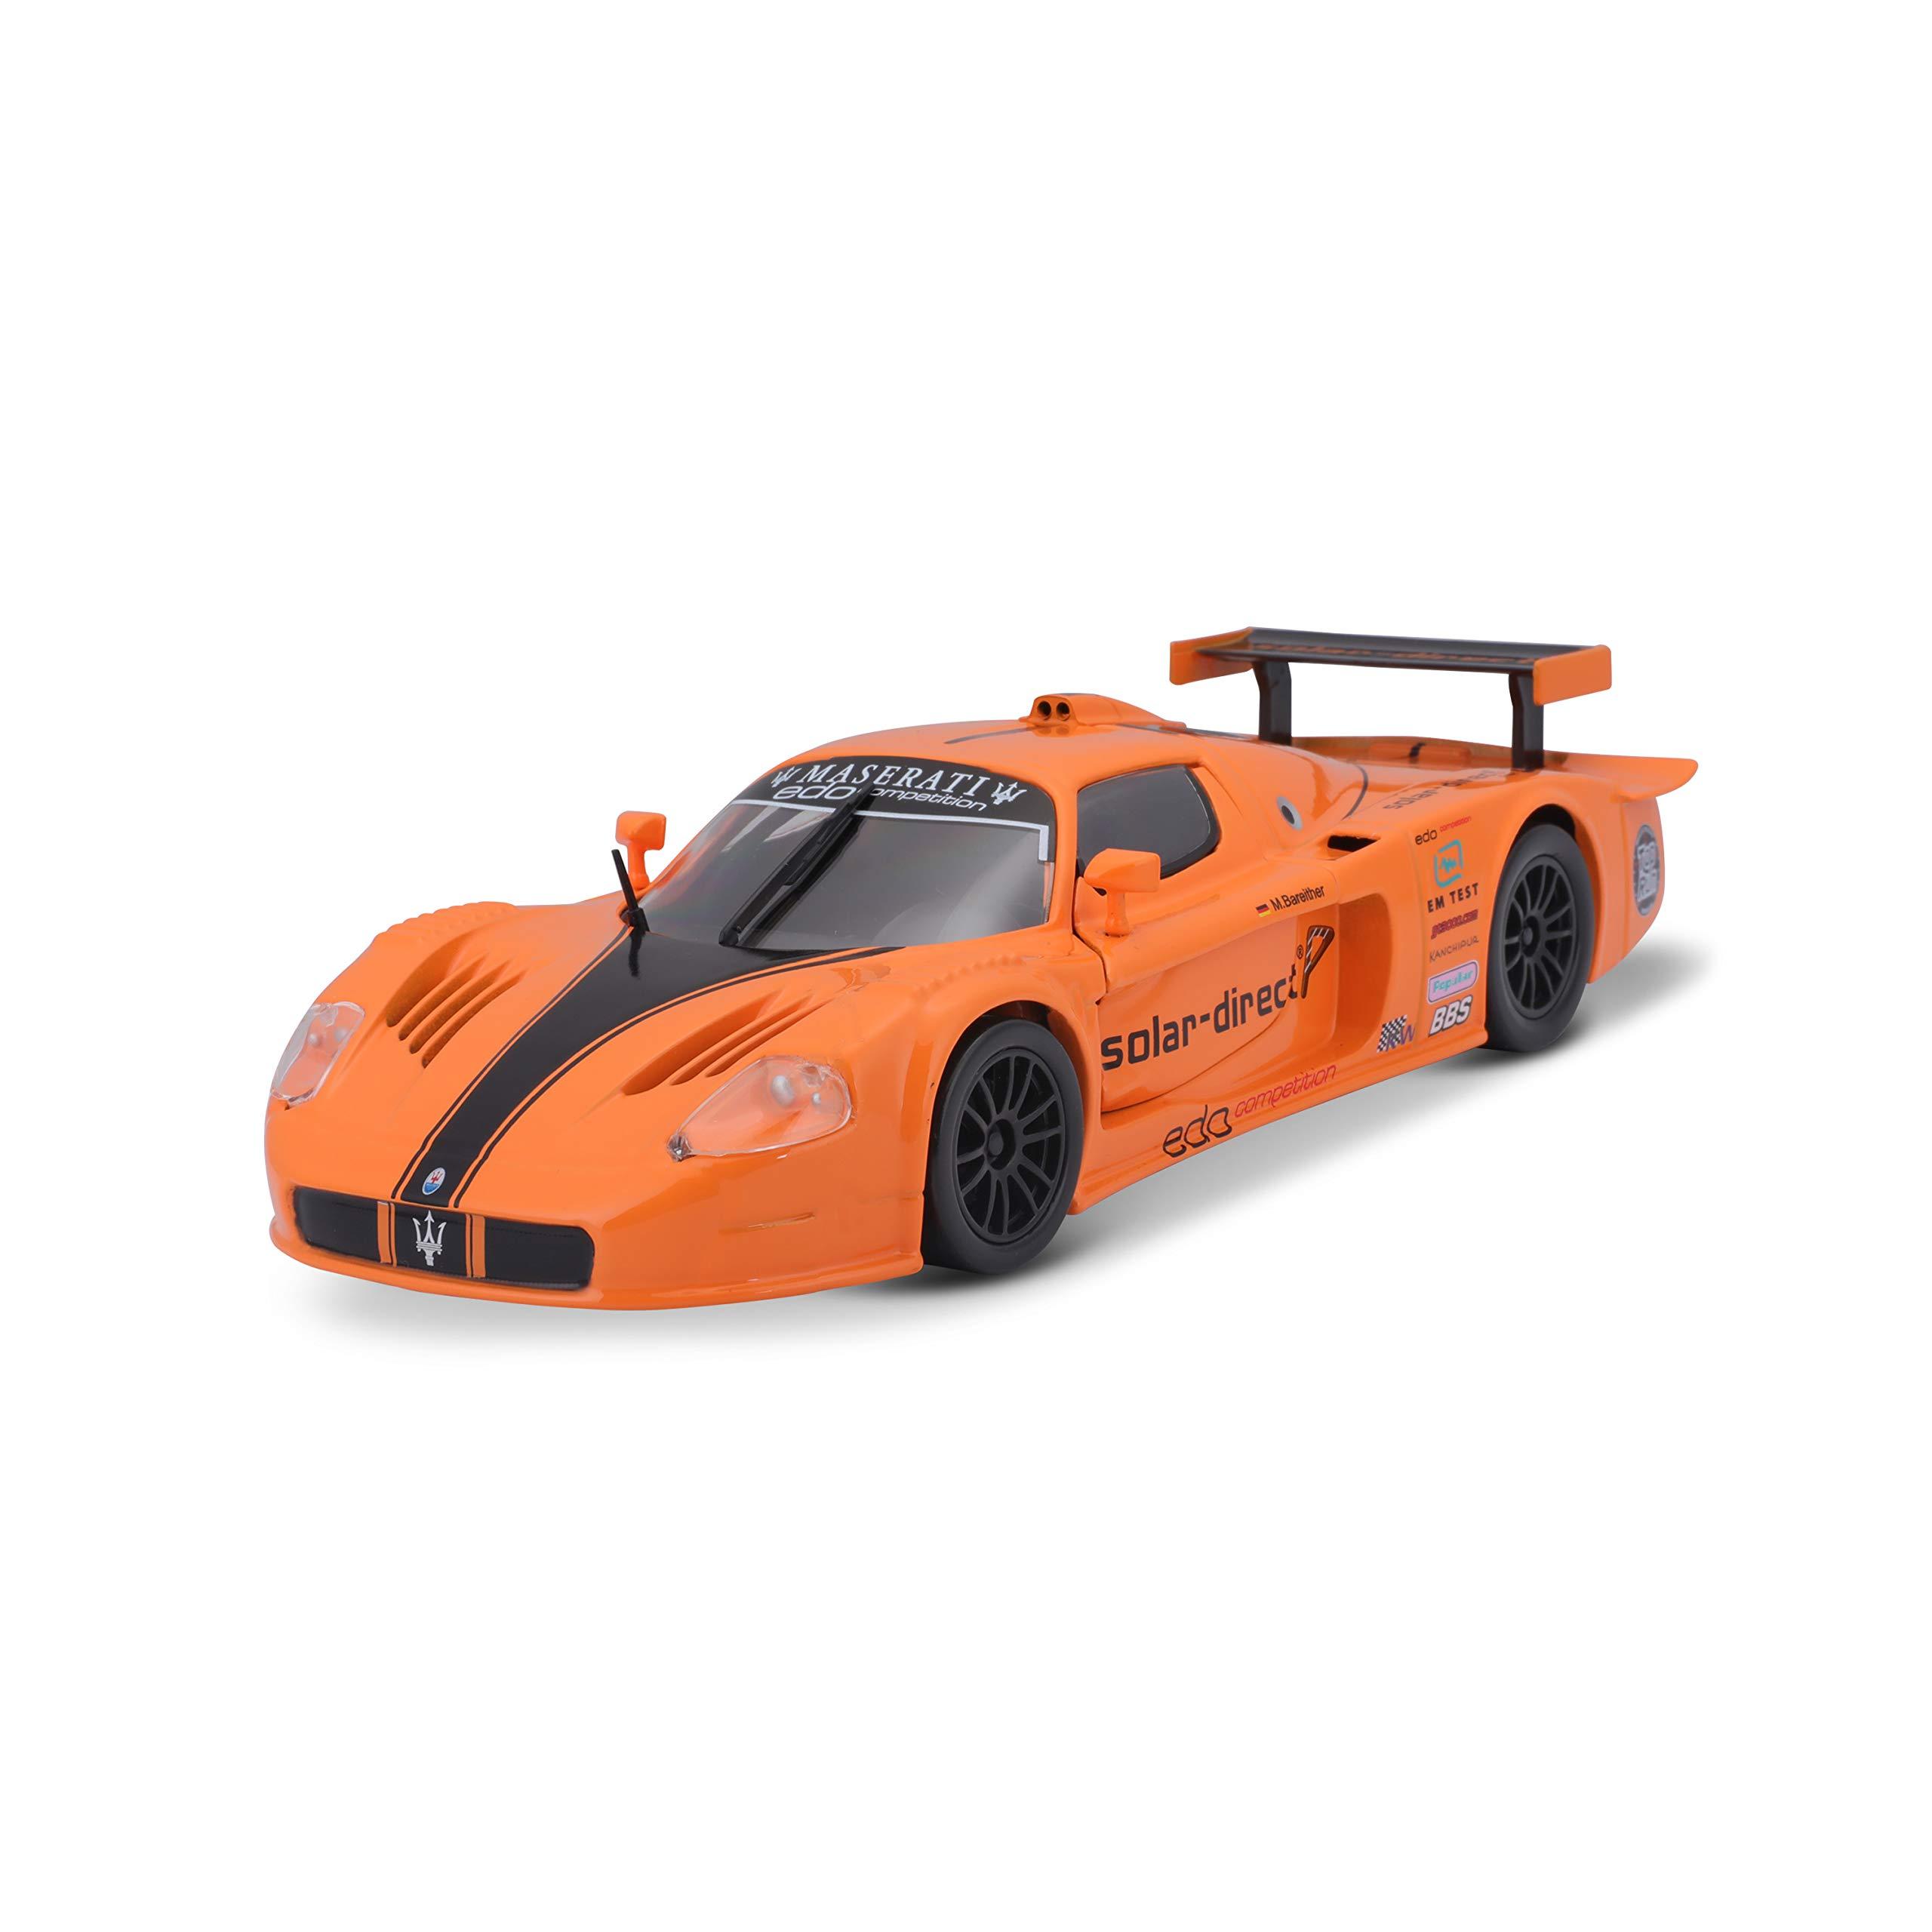 Bburago 18-21078 1:24 Maserati MC12, Orange